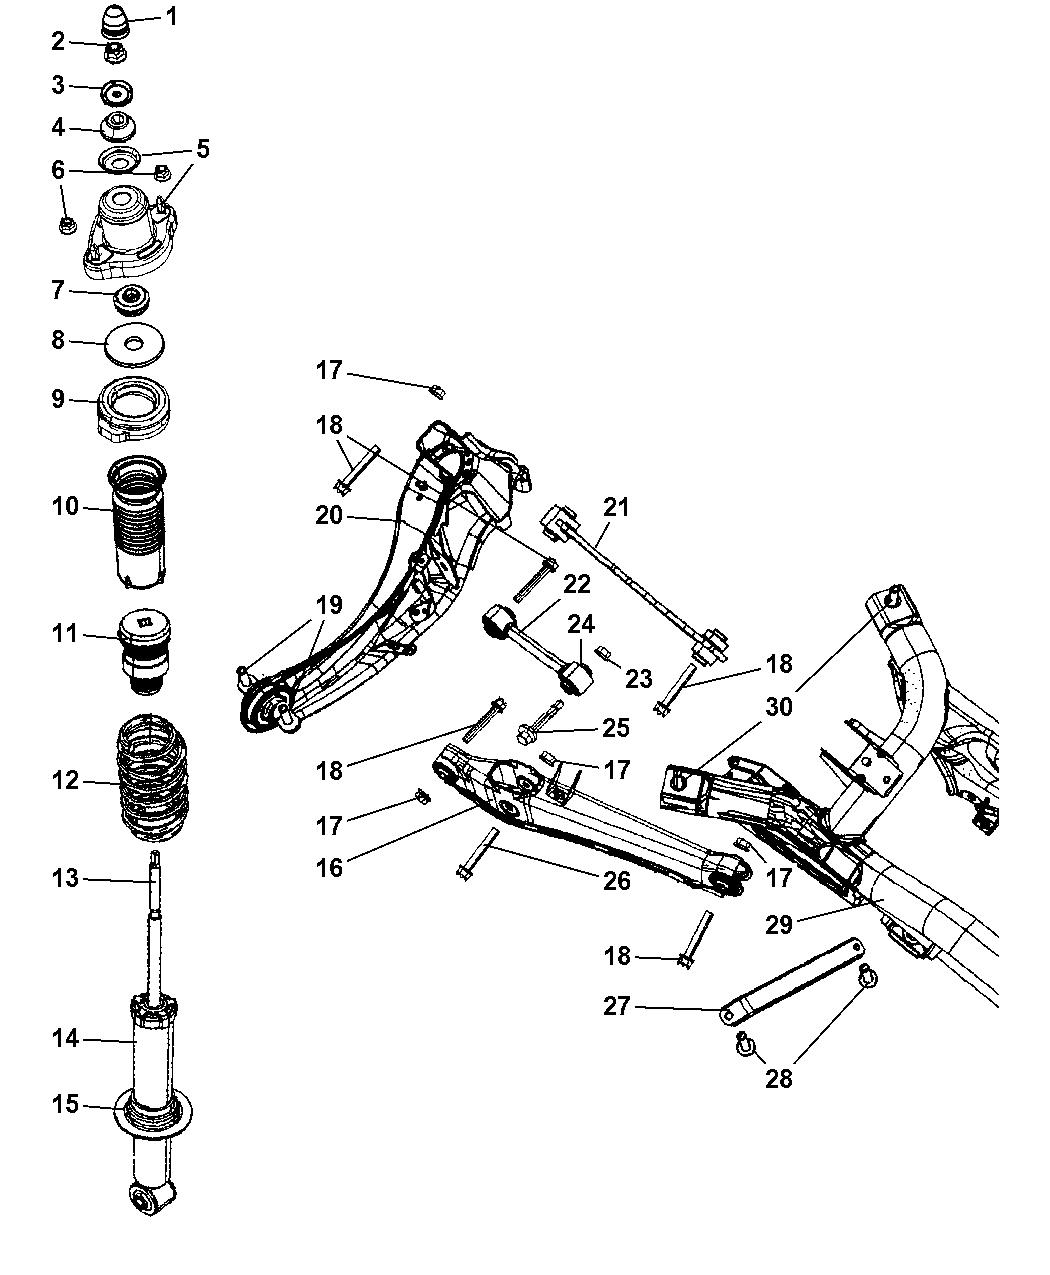 2008 Jeep Compass Suspension - Rear